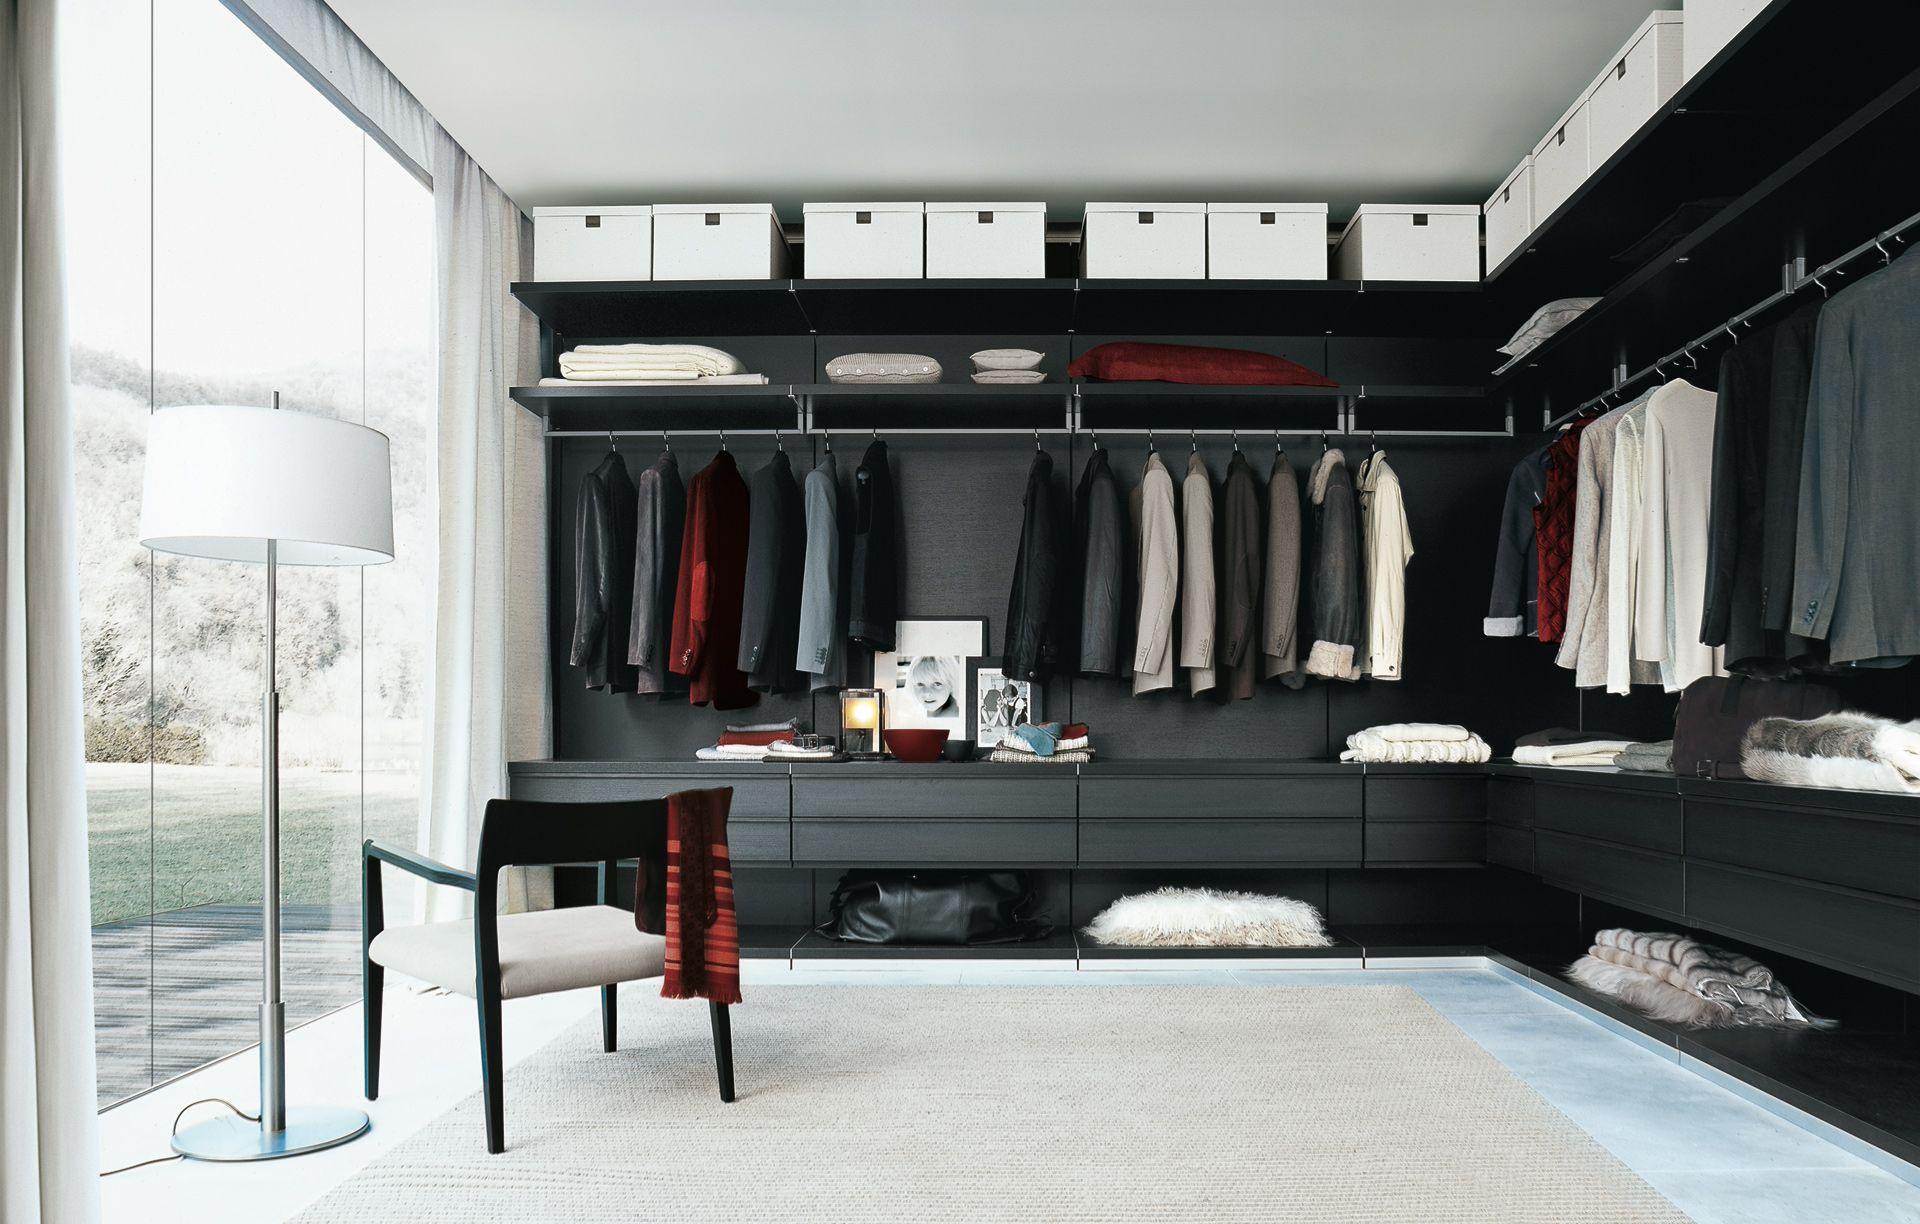 17 Best Images About Wardrobe U0026 Closet   Poliform On Pinterest | Home  Design, Wardrobe Handles And Wardrobes